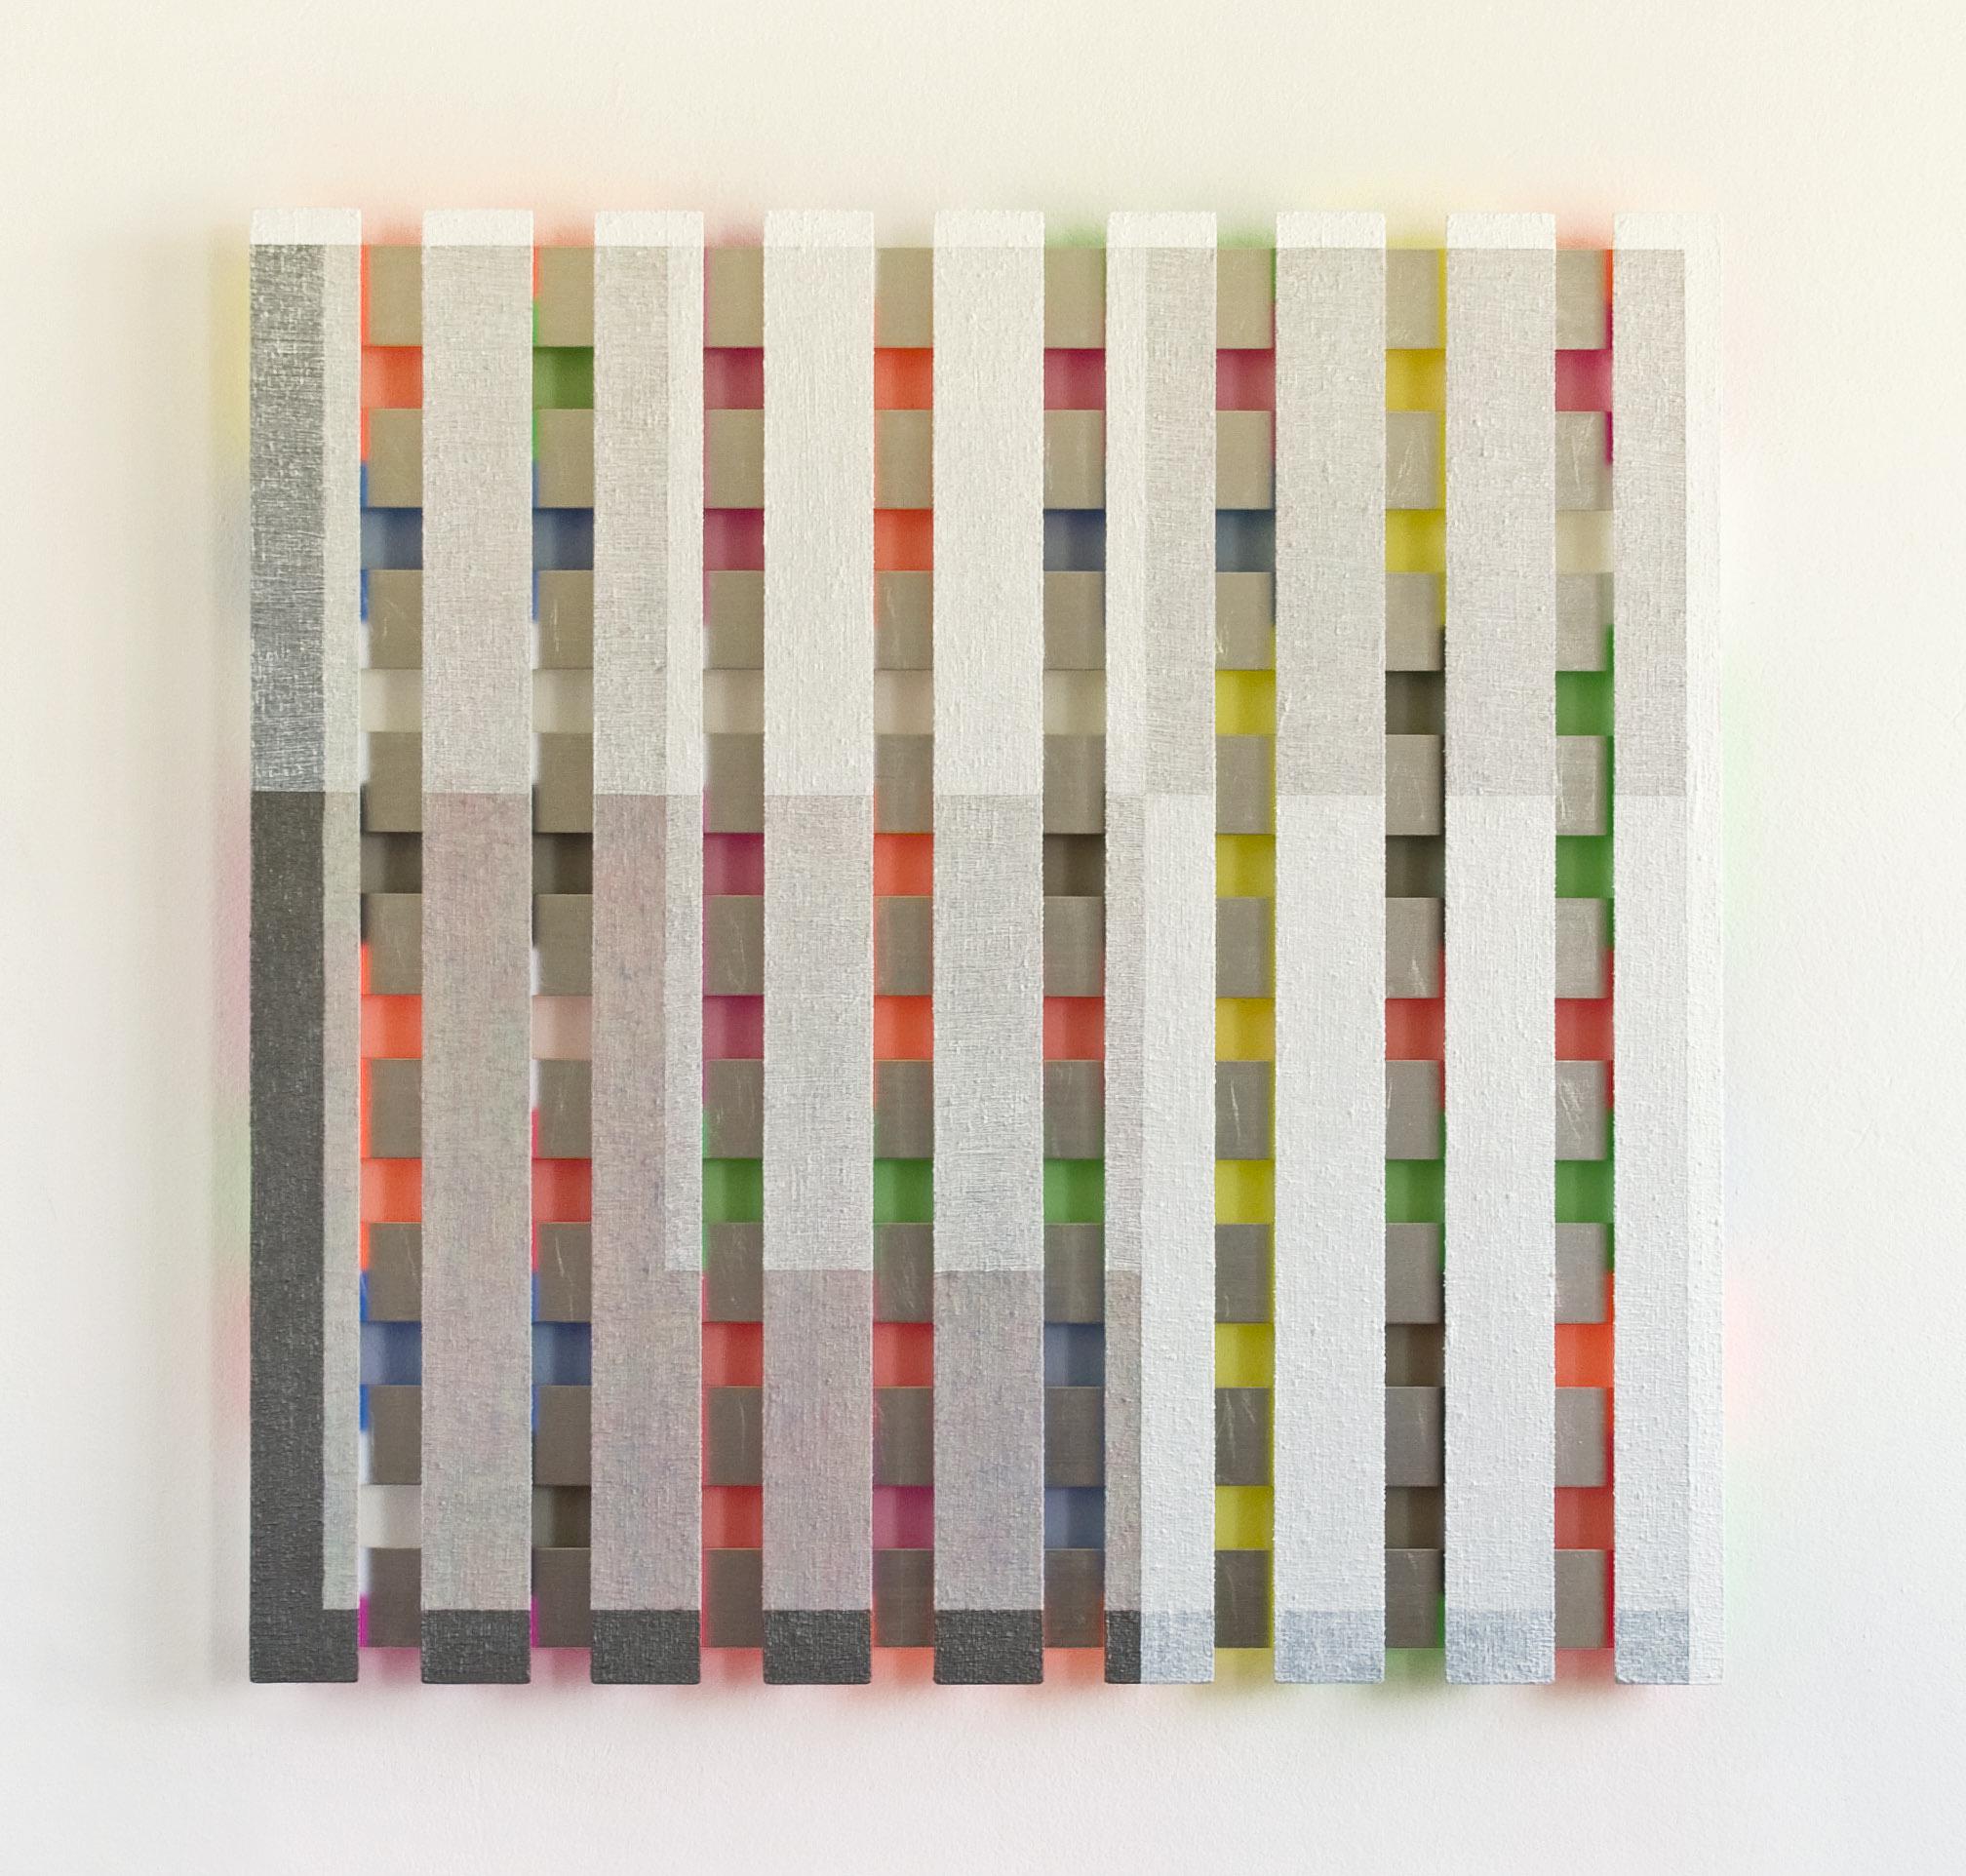 2e akril, les, 121 x 121 cm, 2009.jpg